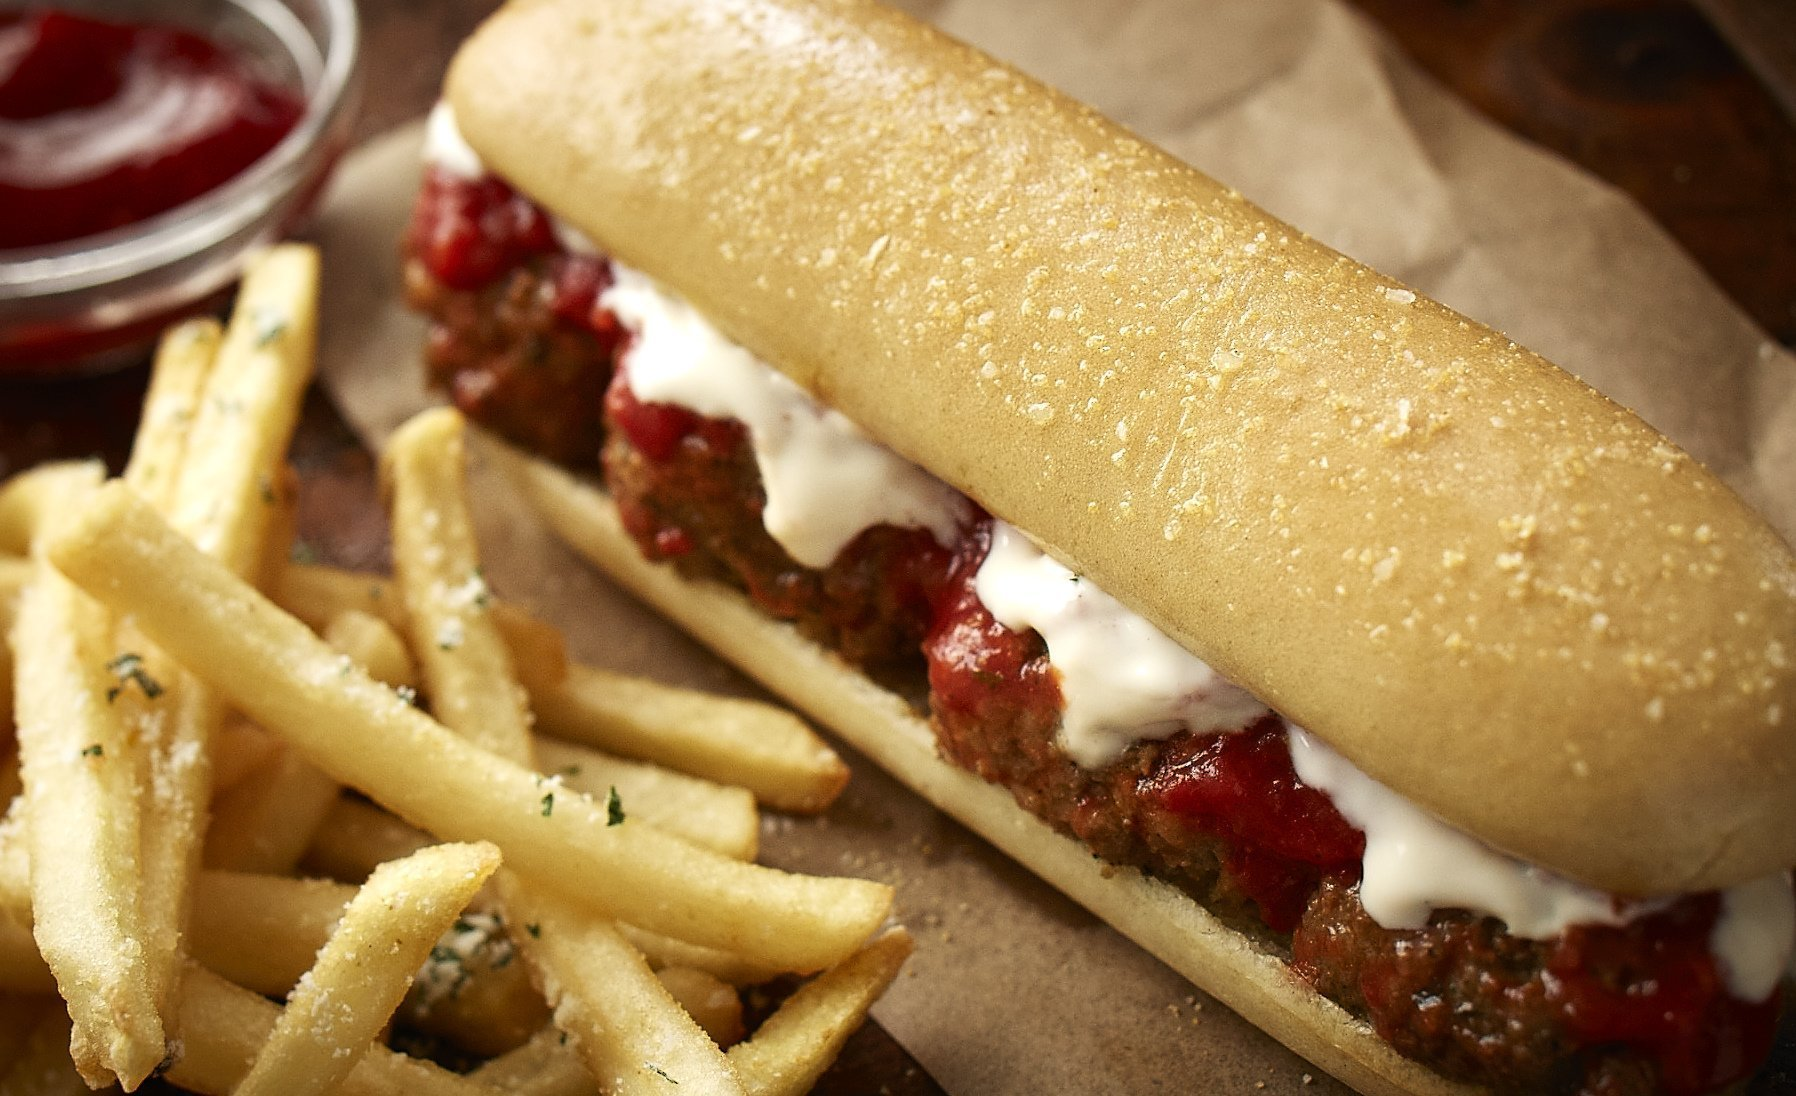 Olive Garden selling breadstick sandwiches - Chicago Tribune